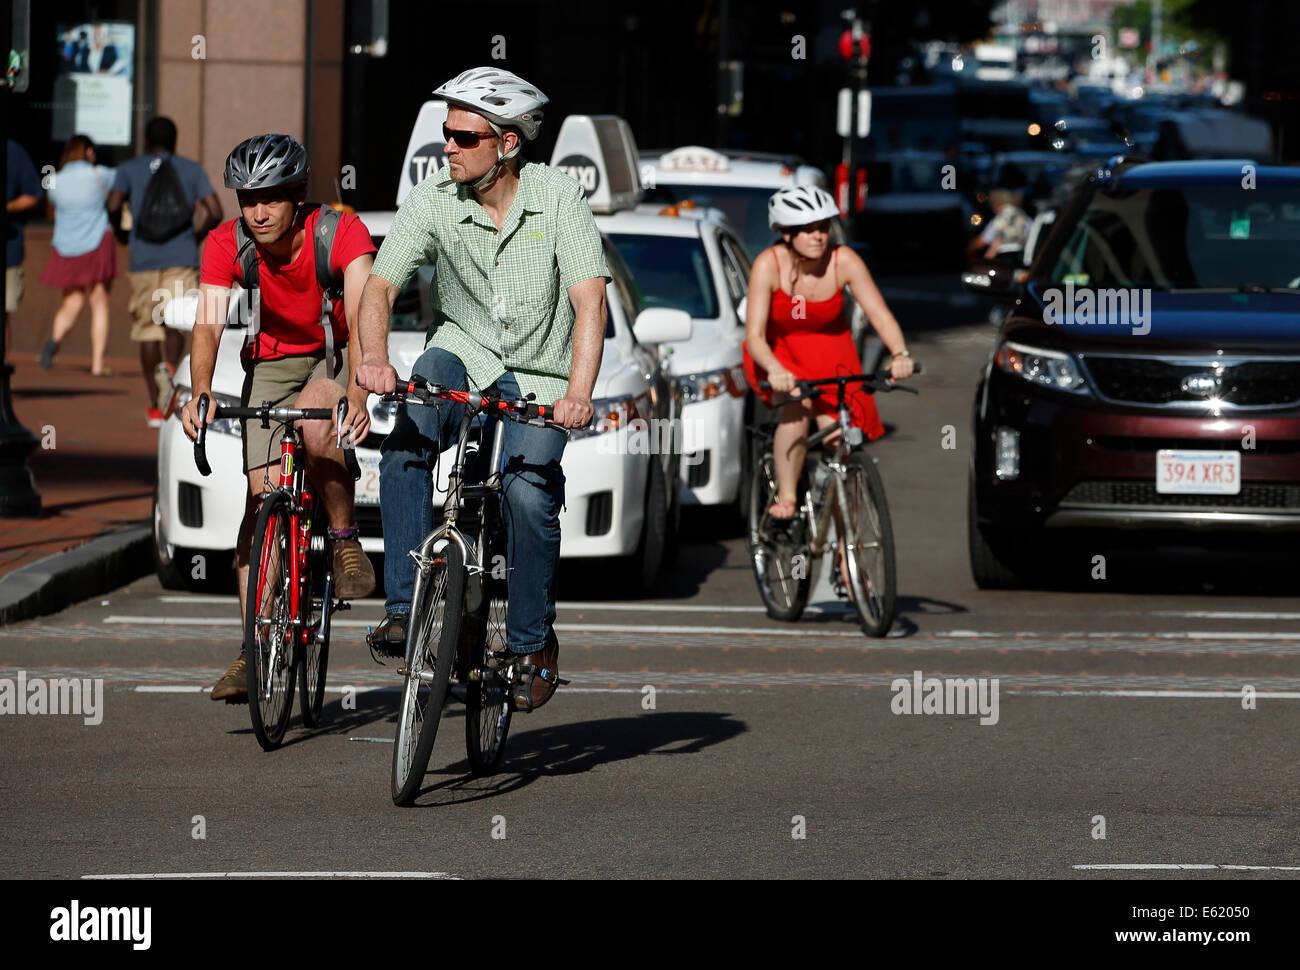 Bicyclists on State Street, downtown, Boston, Massachusetts, USA - Stock Image